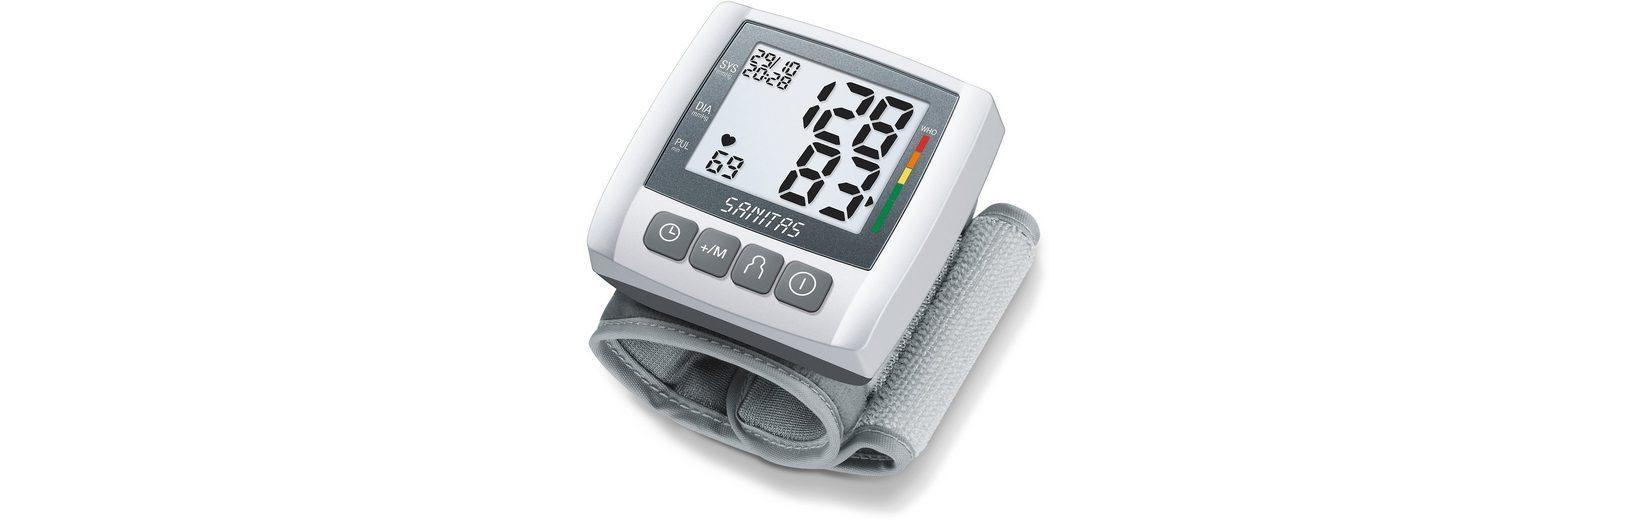 Sanitas, Blutdruckmessgerät, SBC 21